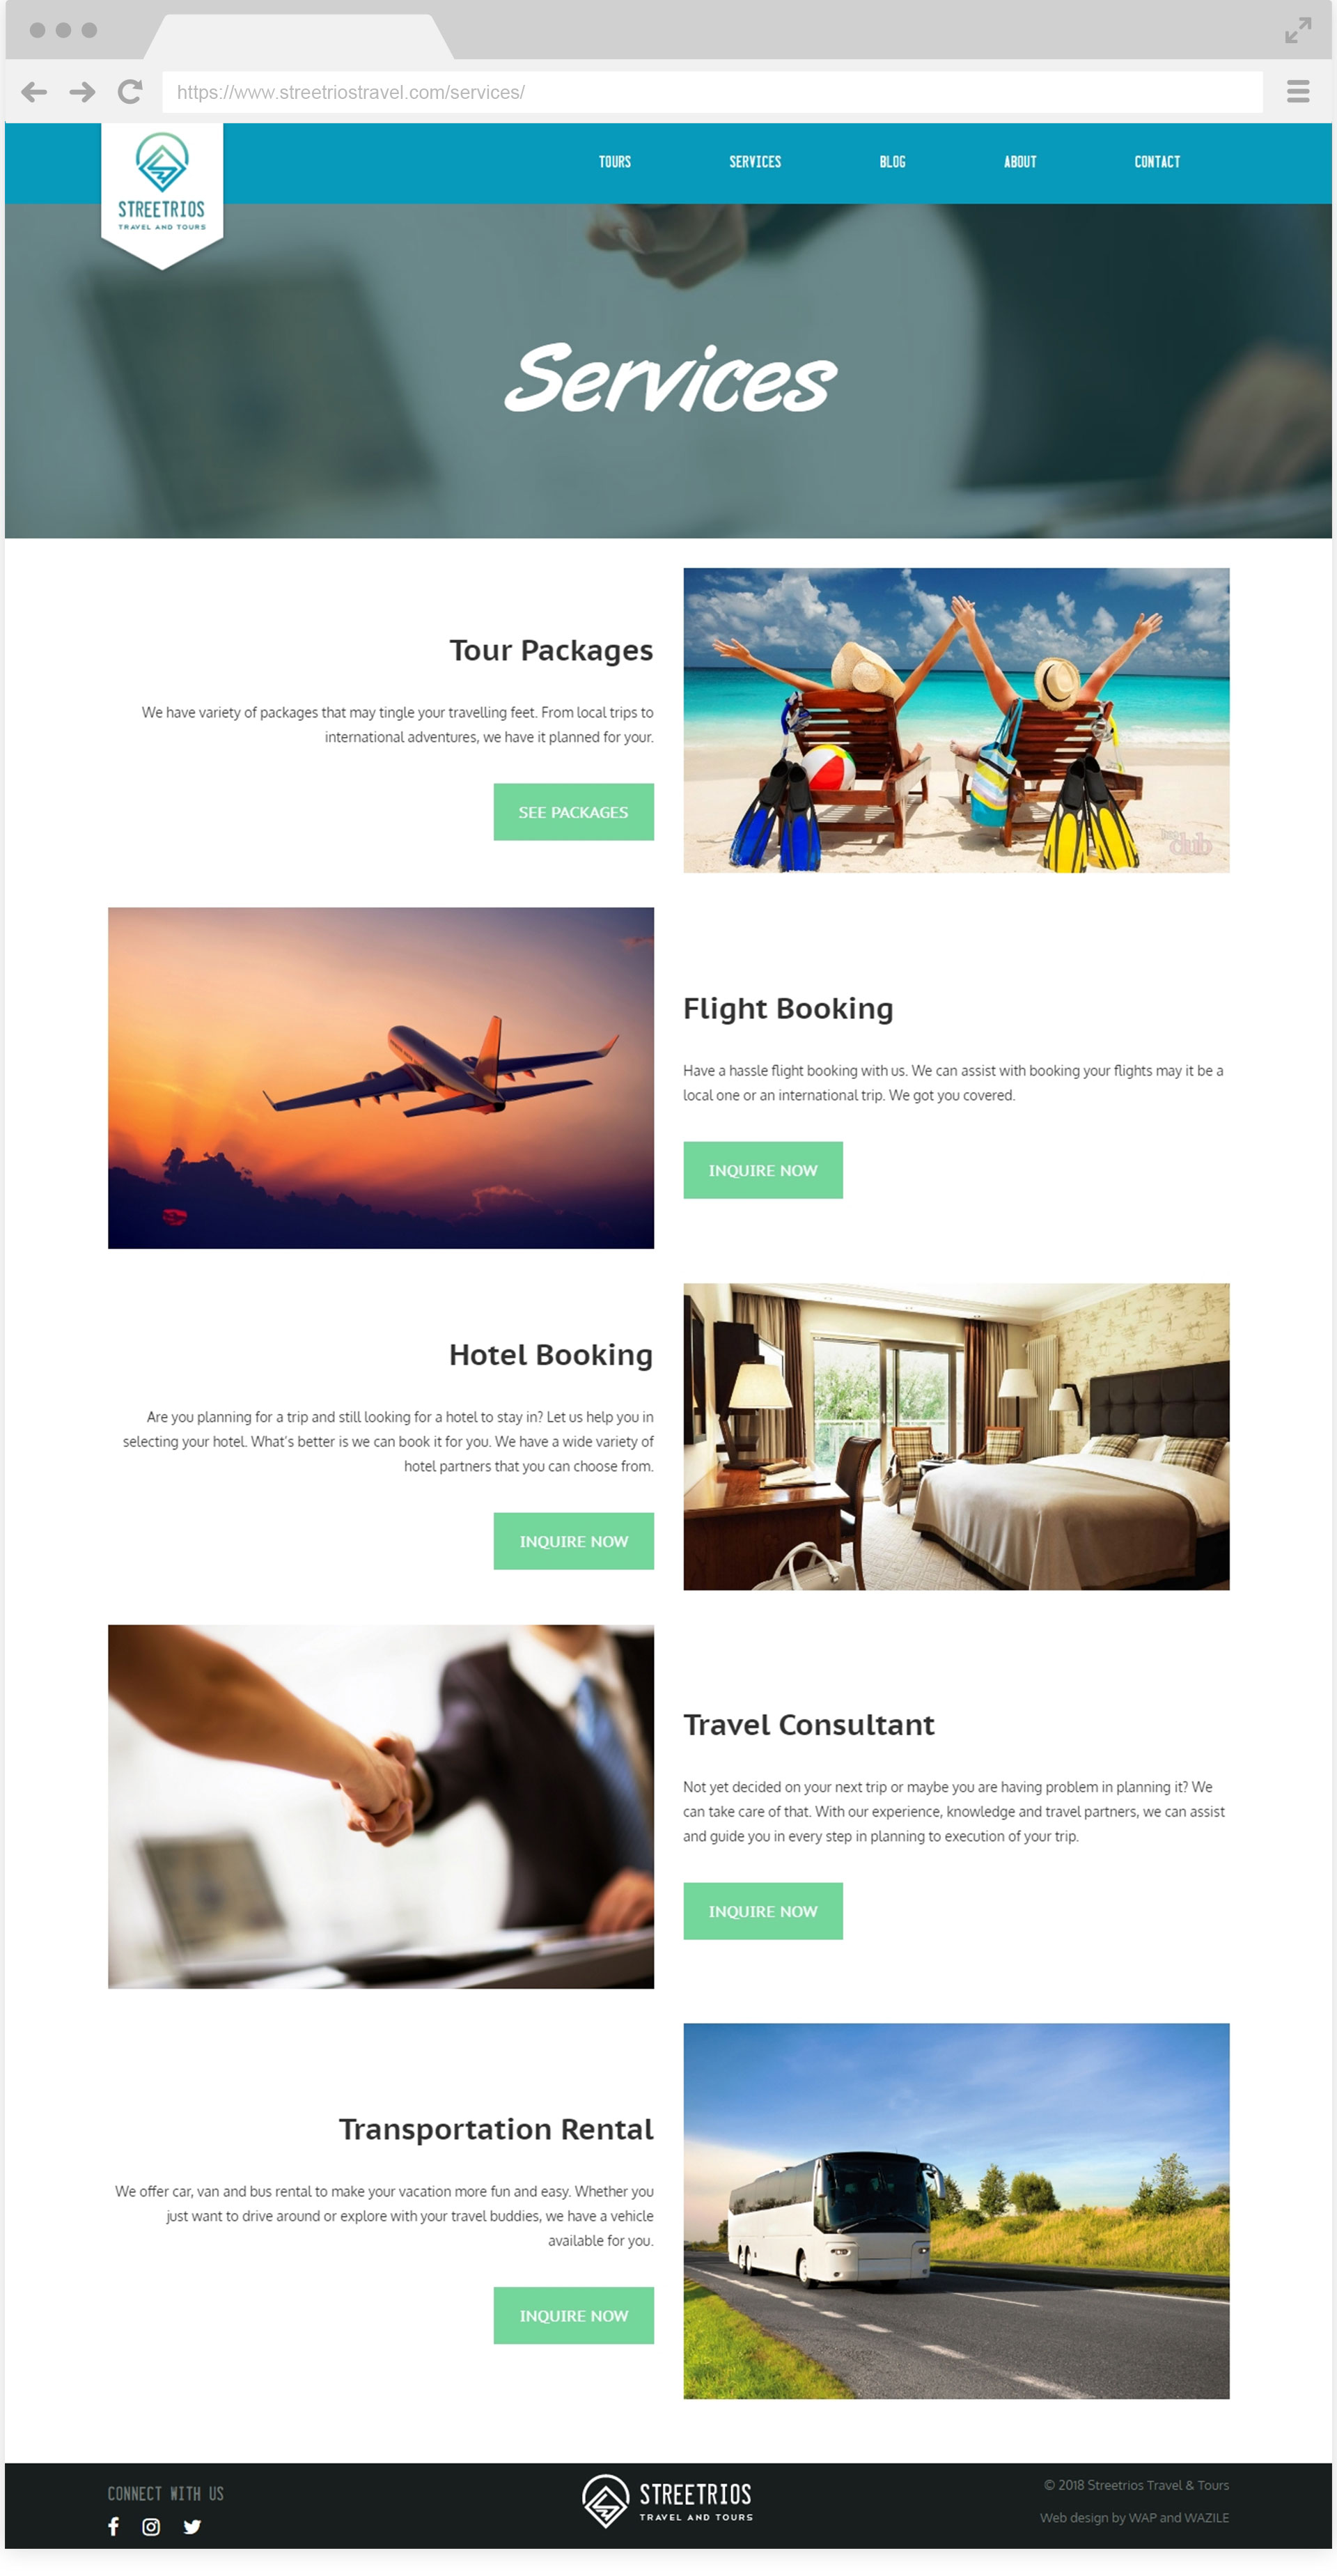 Streetrios Travel Services